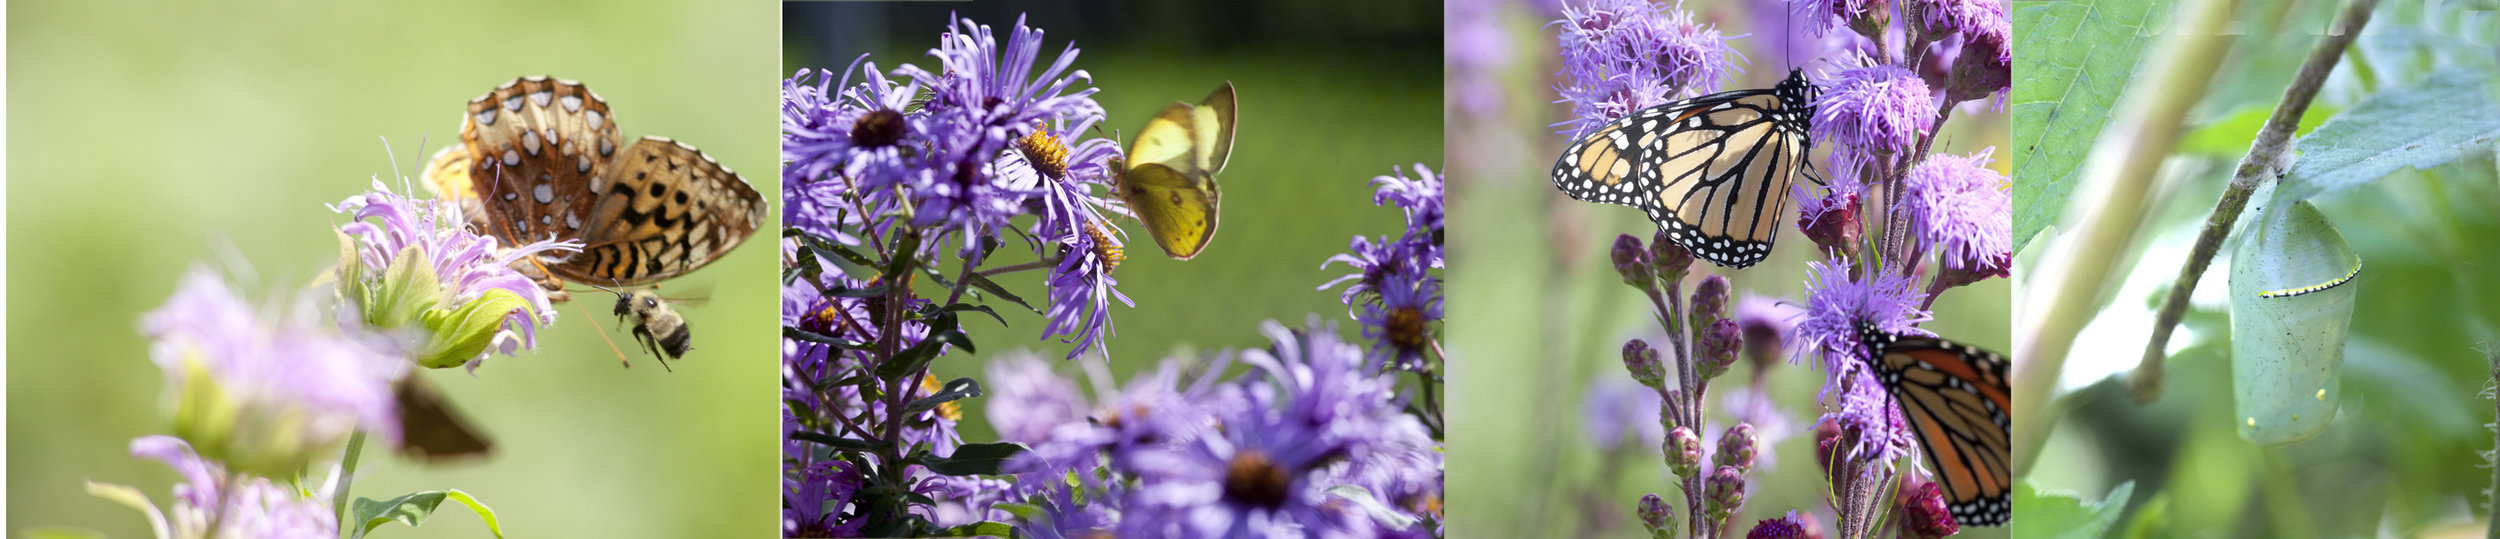 butterflybanner.jpg